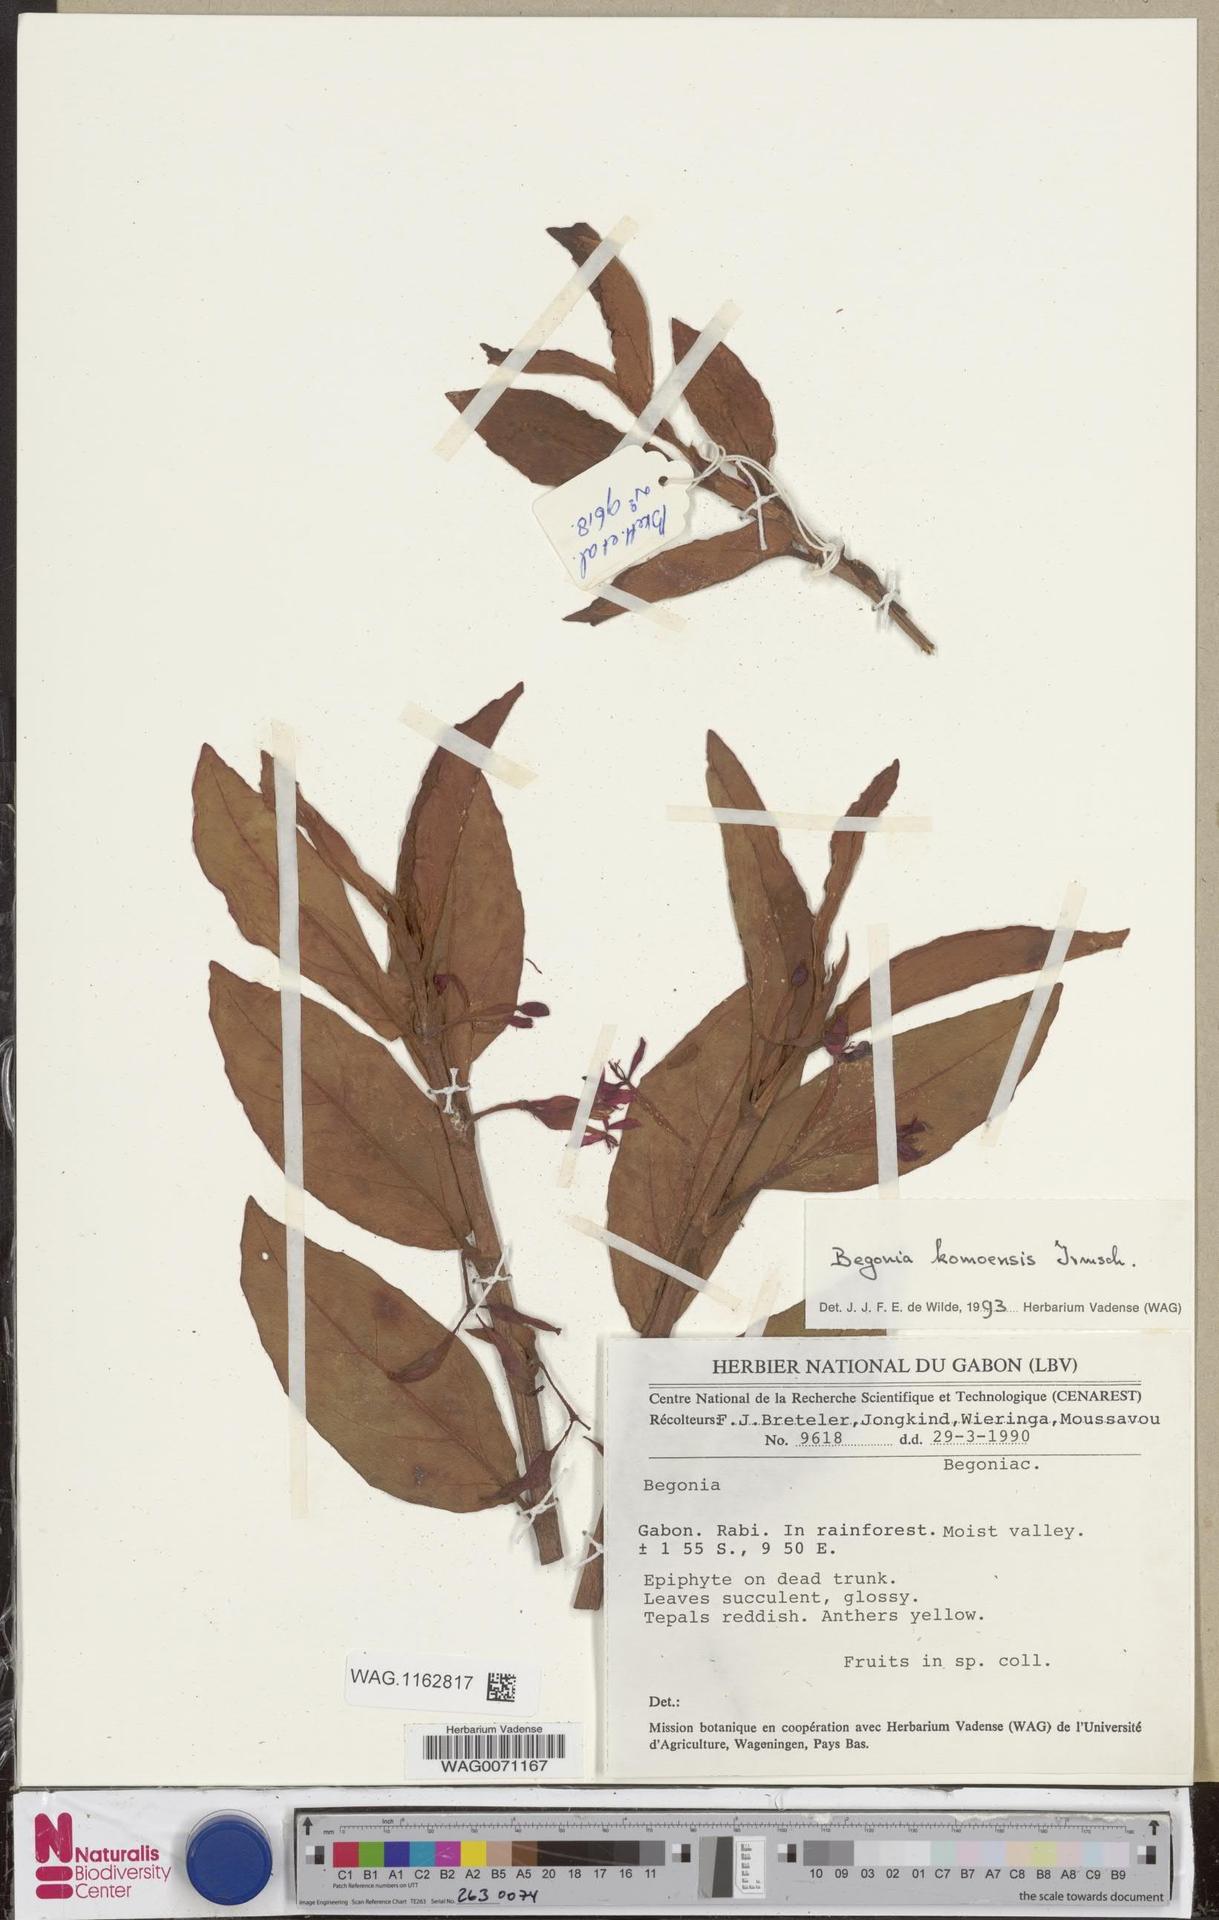 WAG.1162817 | Begonia komoensis Irmsch.